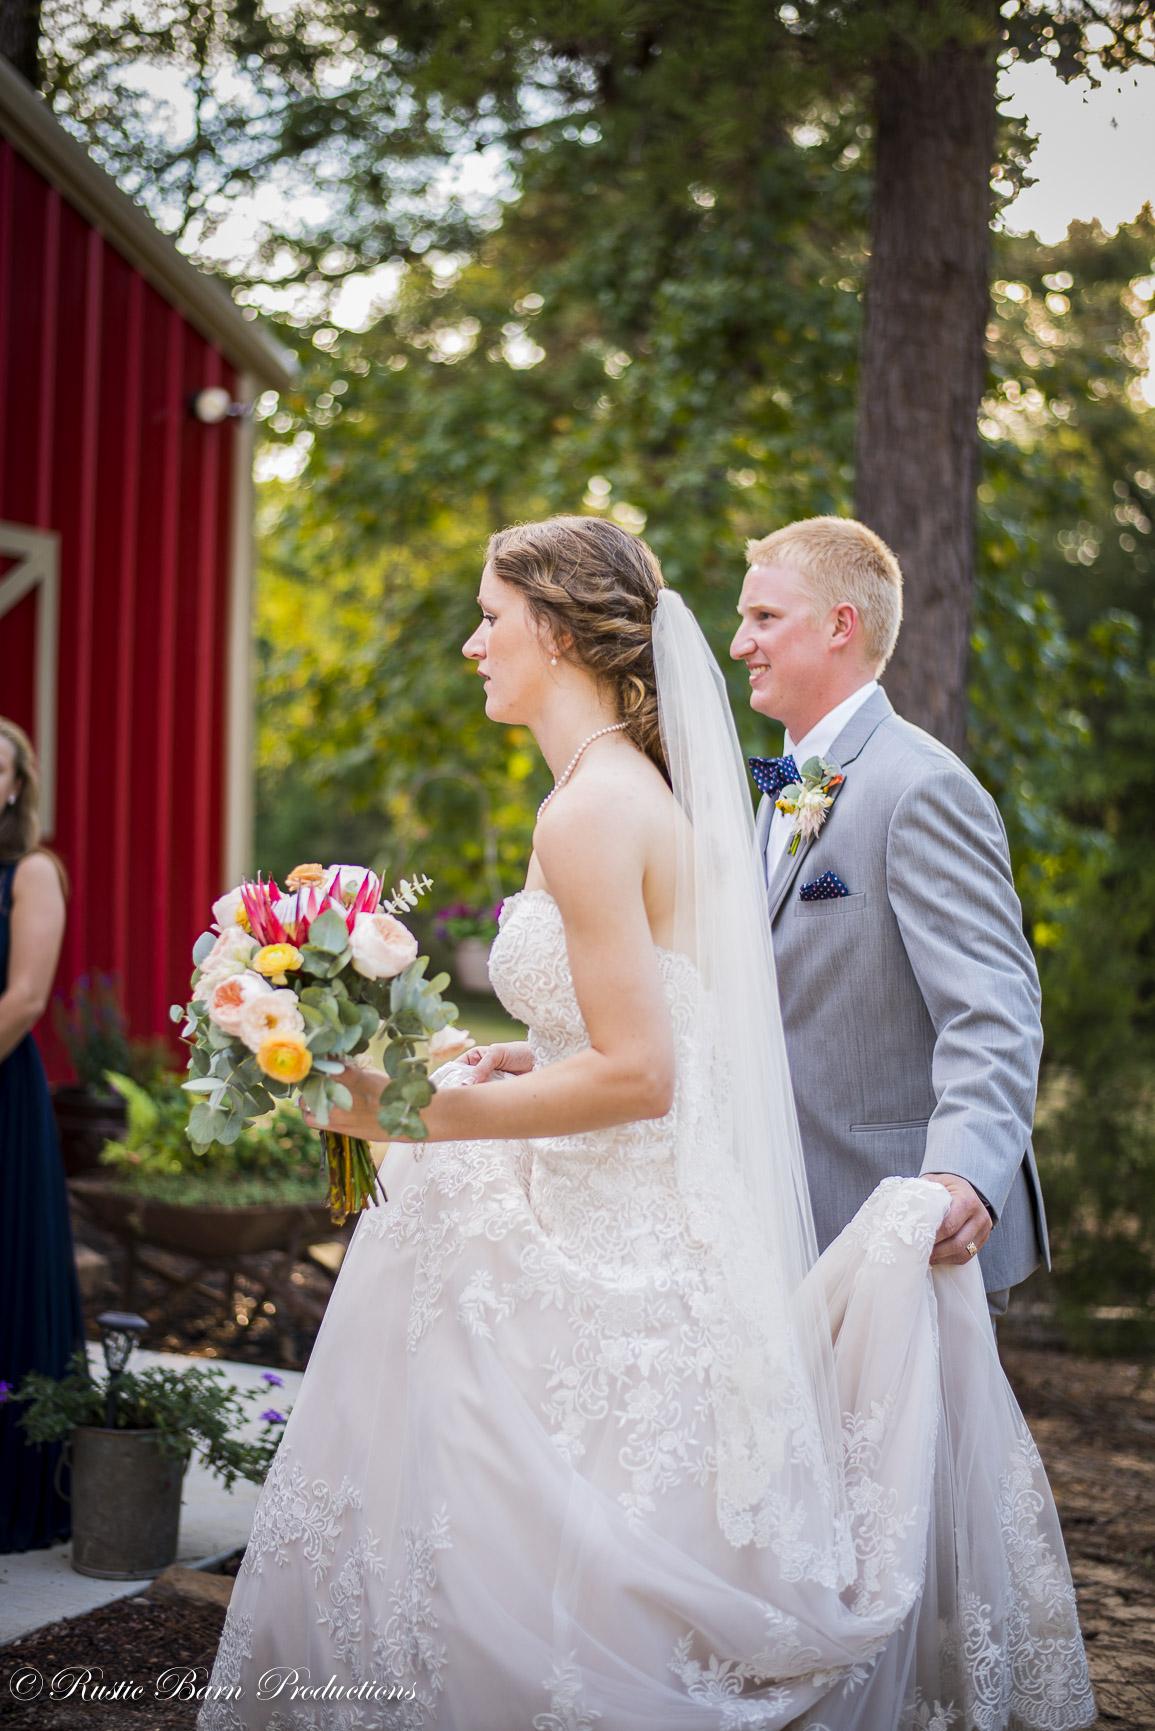 Shelby and Nates wedding-9479.jpg